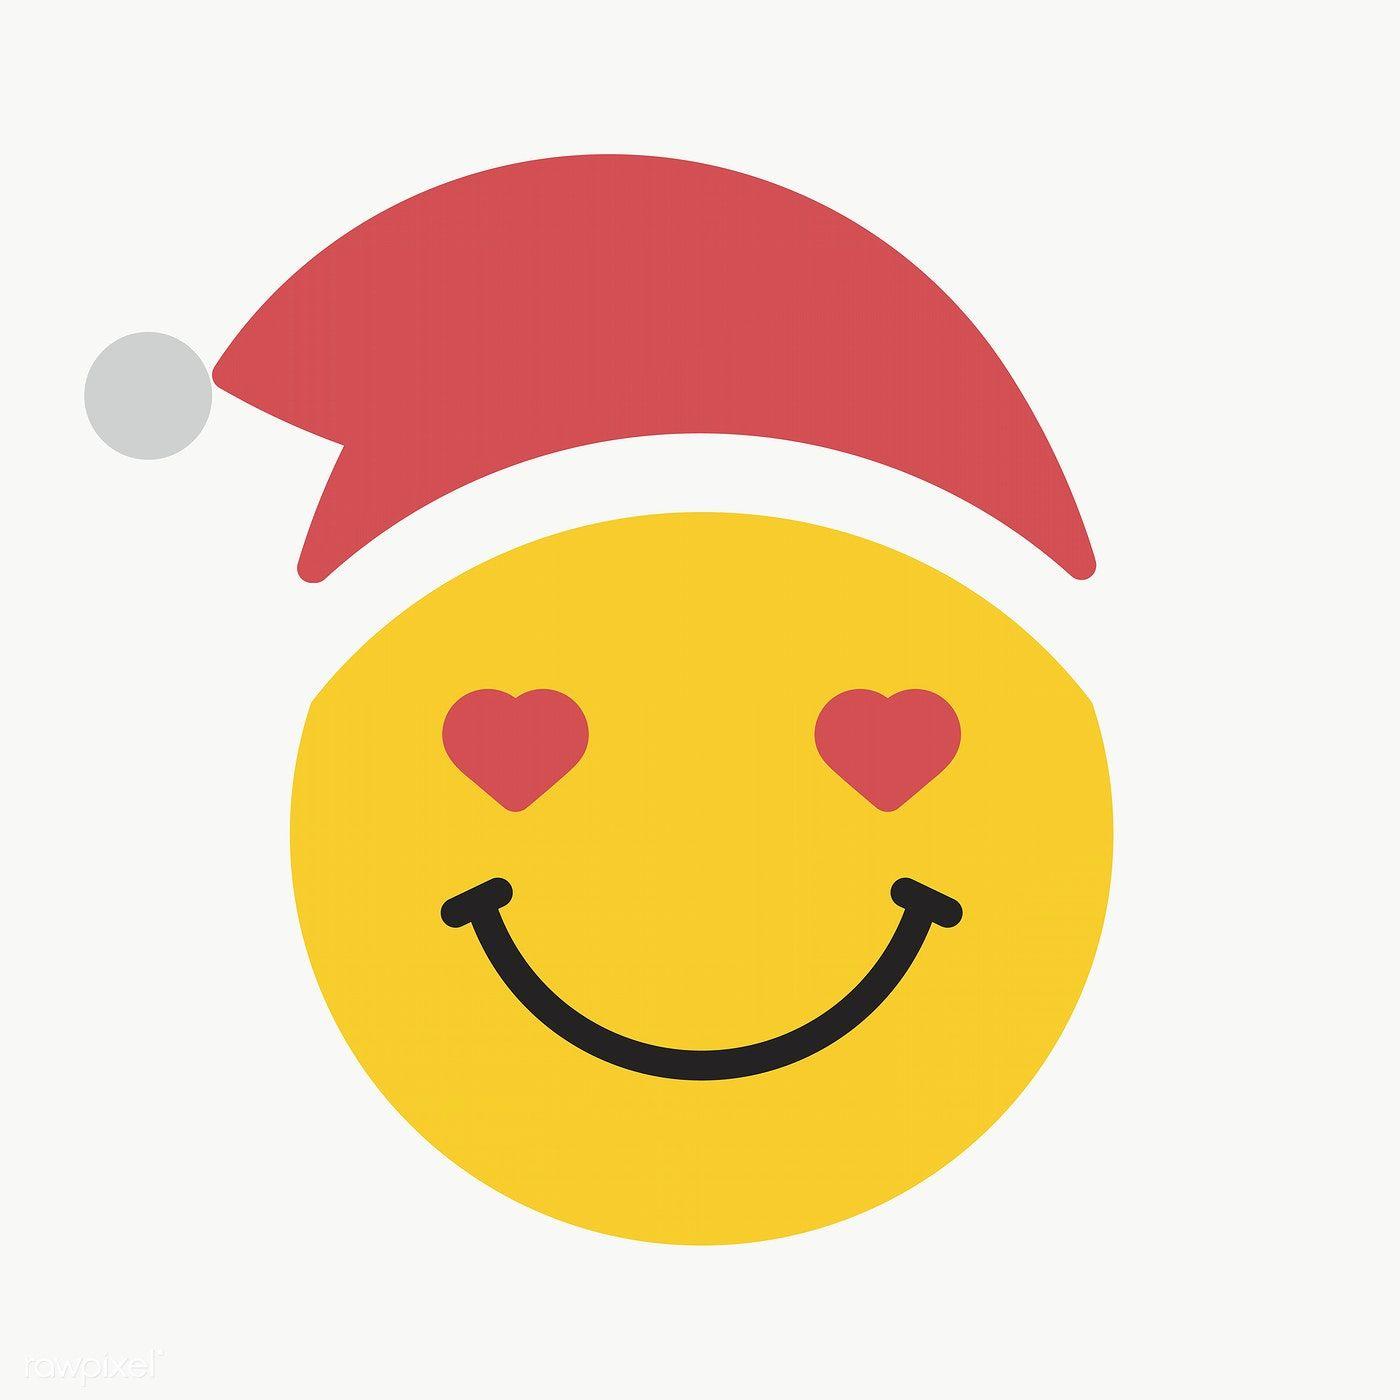 Round Yellow Santa In Love Emoticon On Transparent Background Vector Premium Image By Rawpixel Com Wan Emoticon Digital Illustration Design Elements